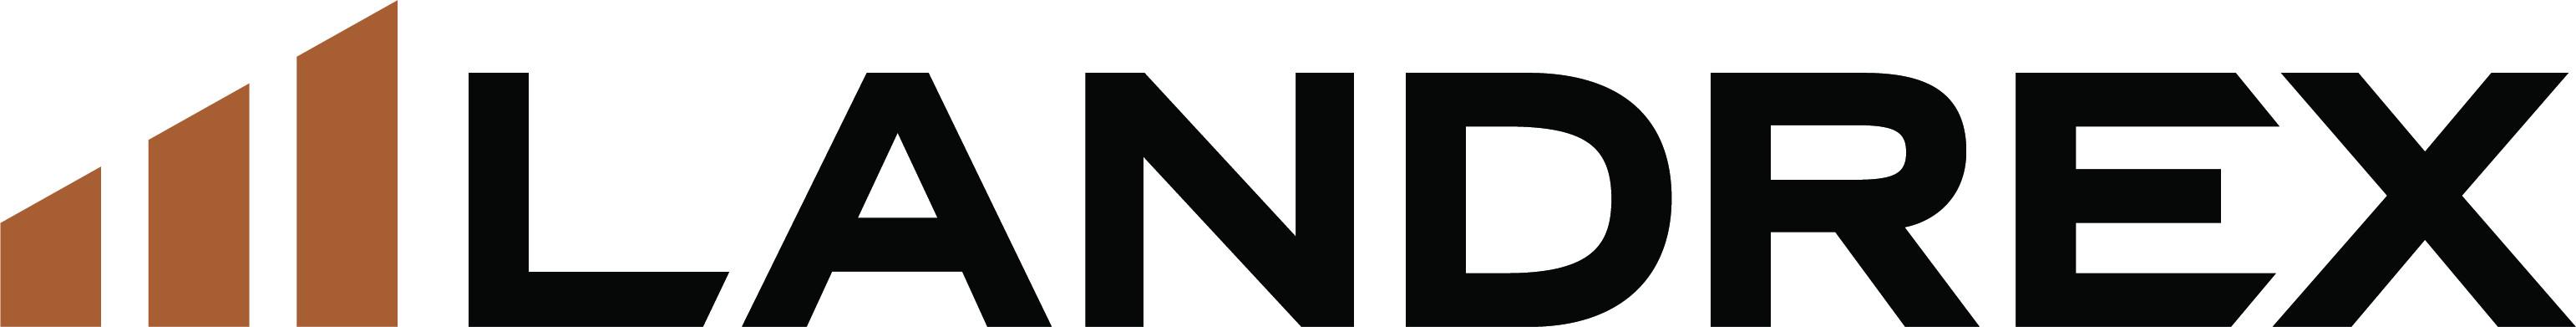 Landrex Logo